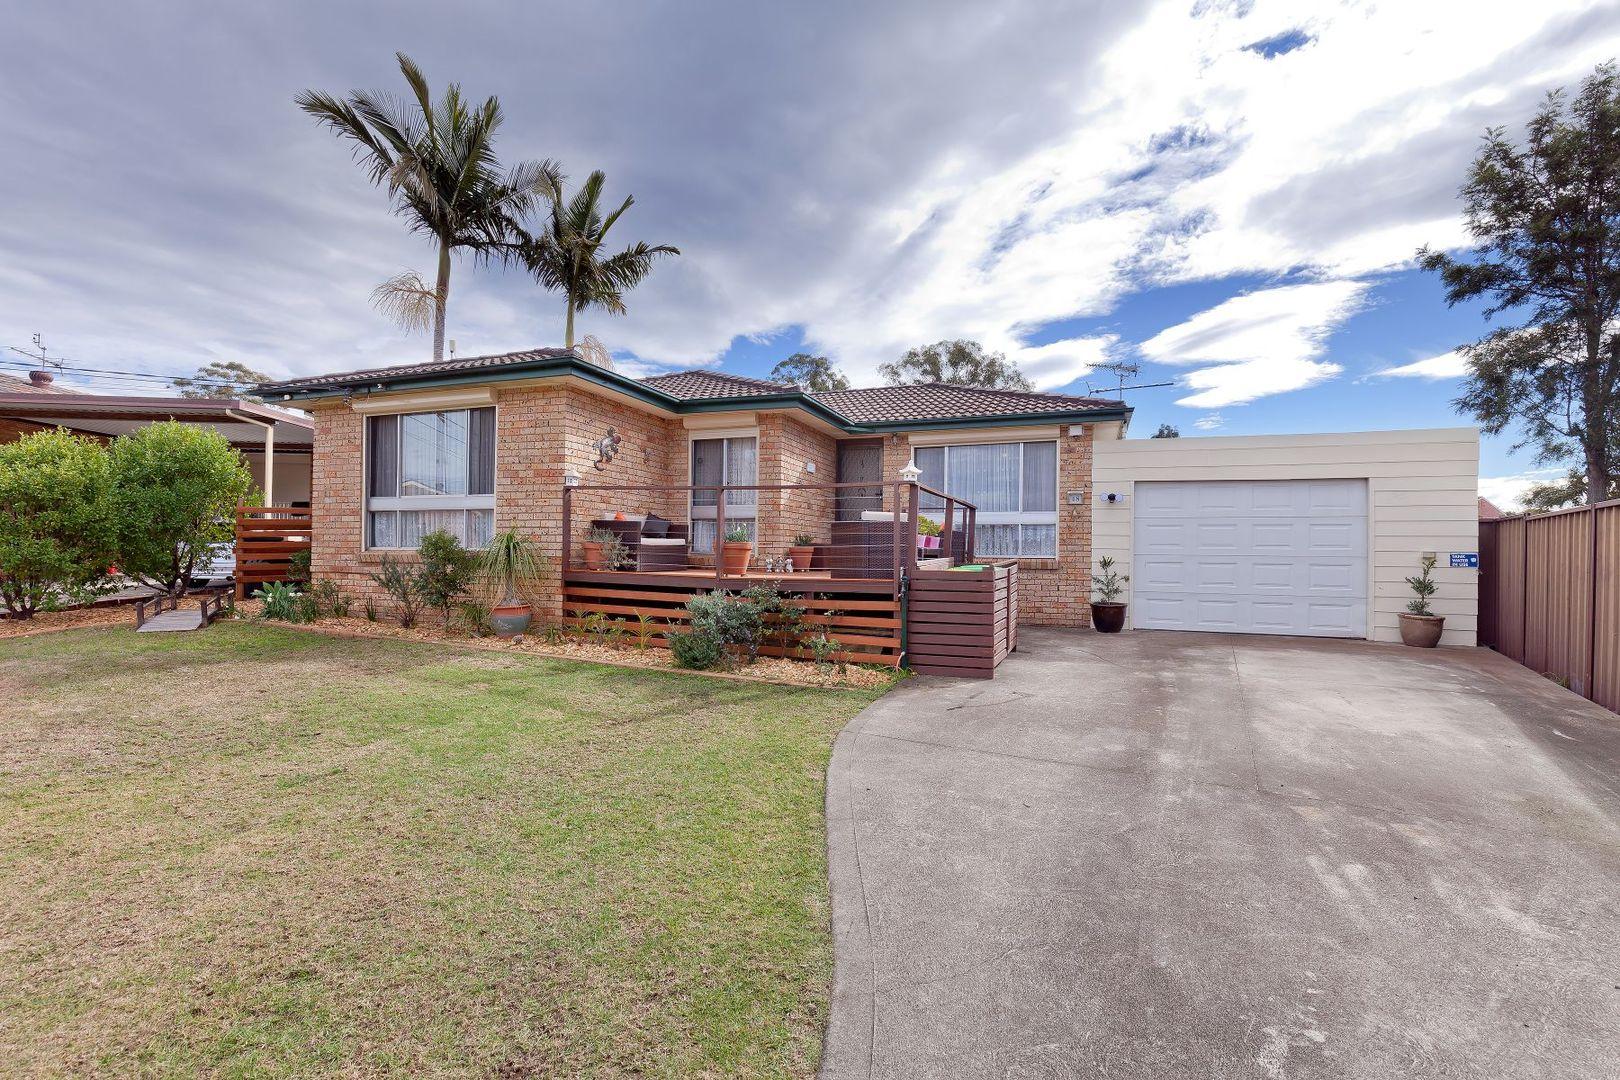 48 Oag Crescent, Kingswood NSW 2747, Image 0